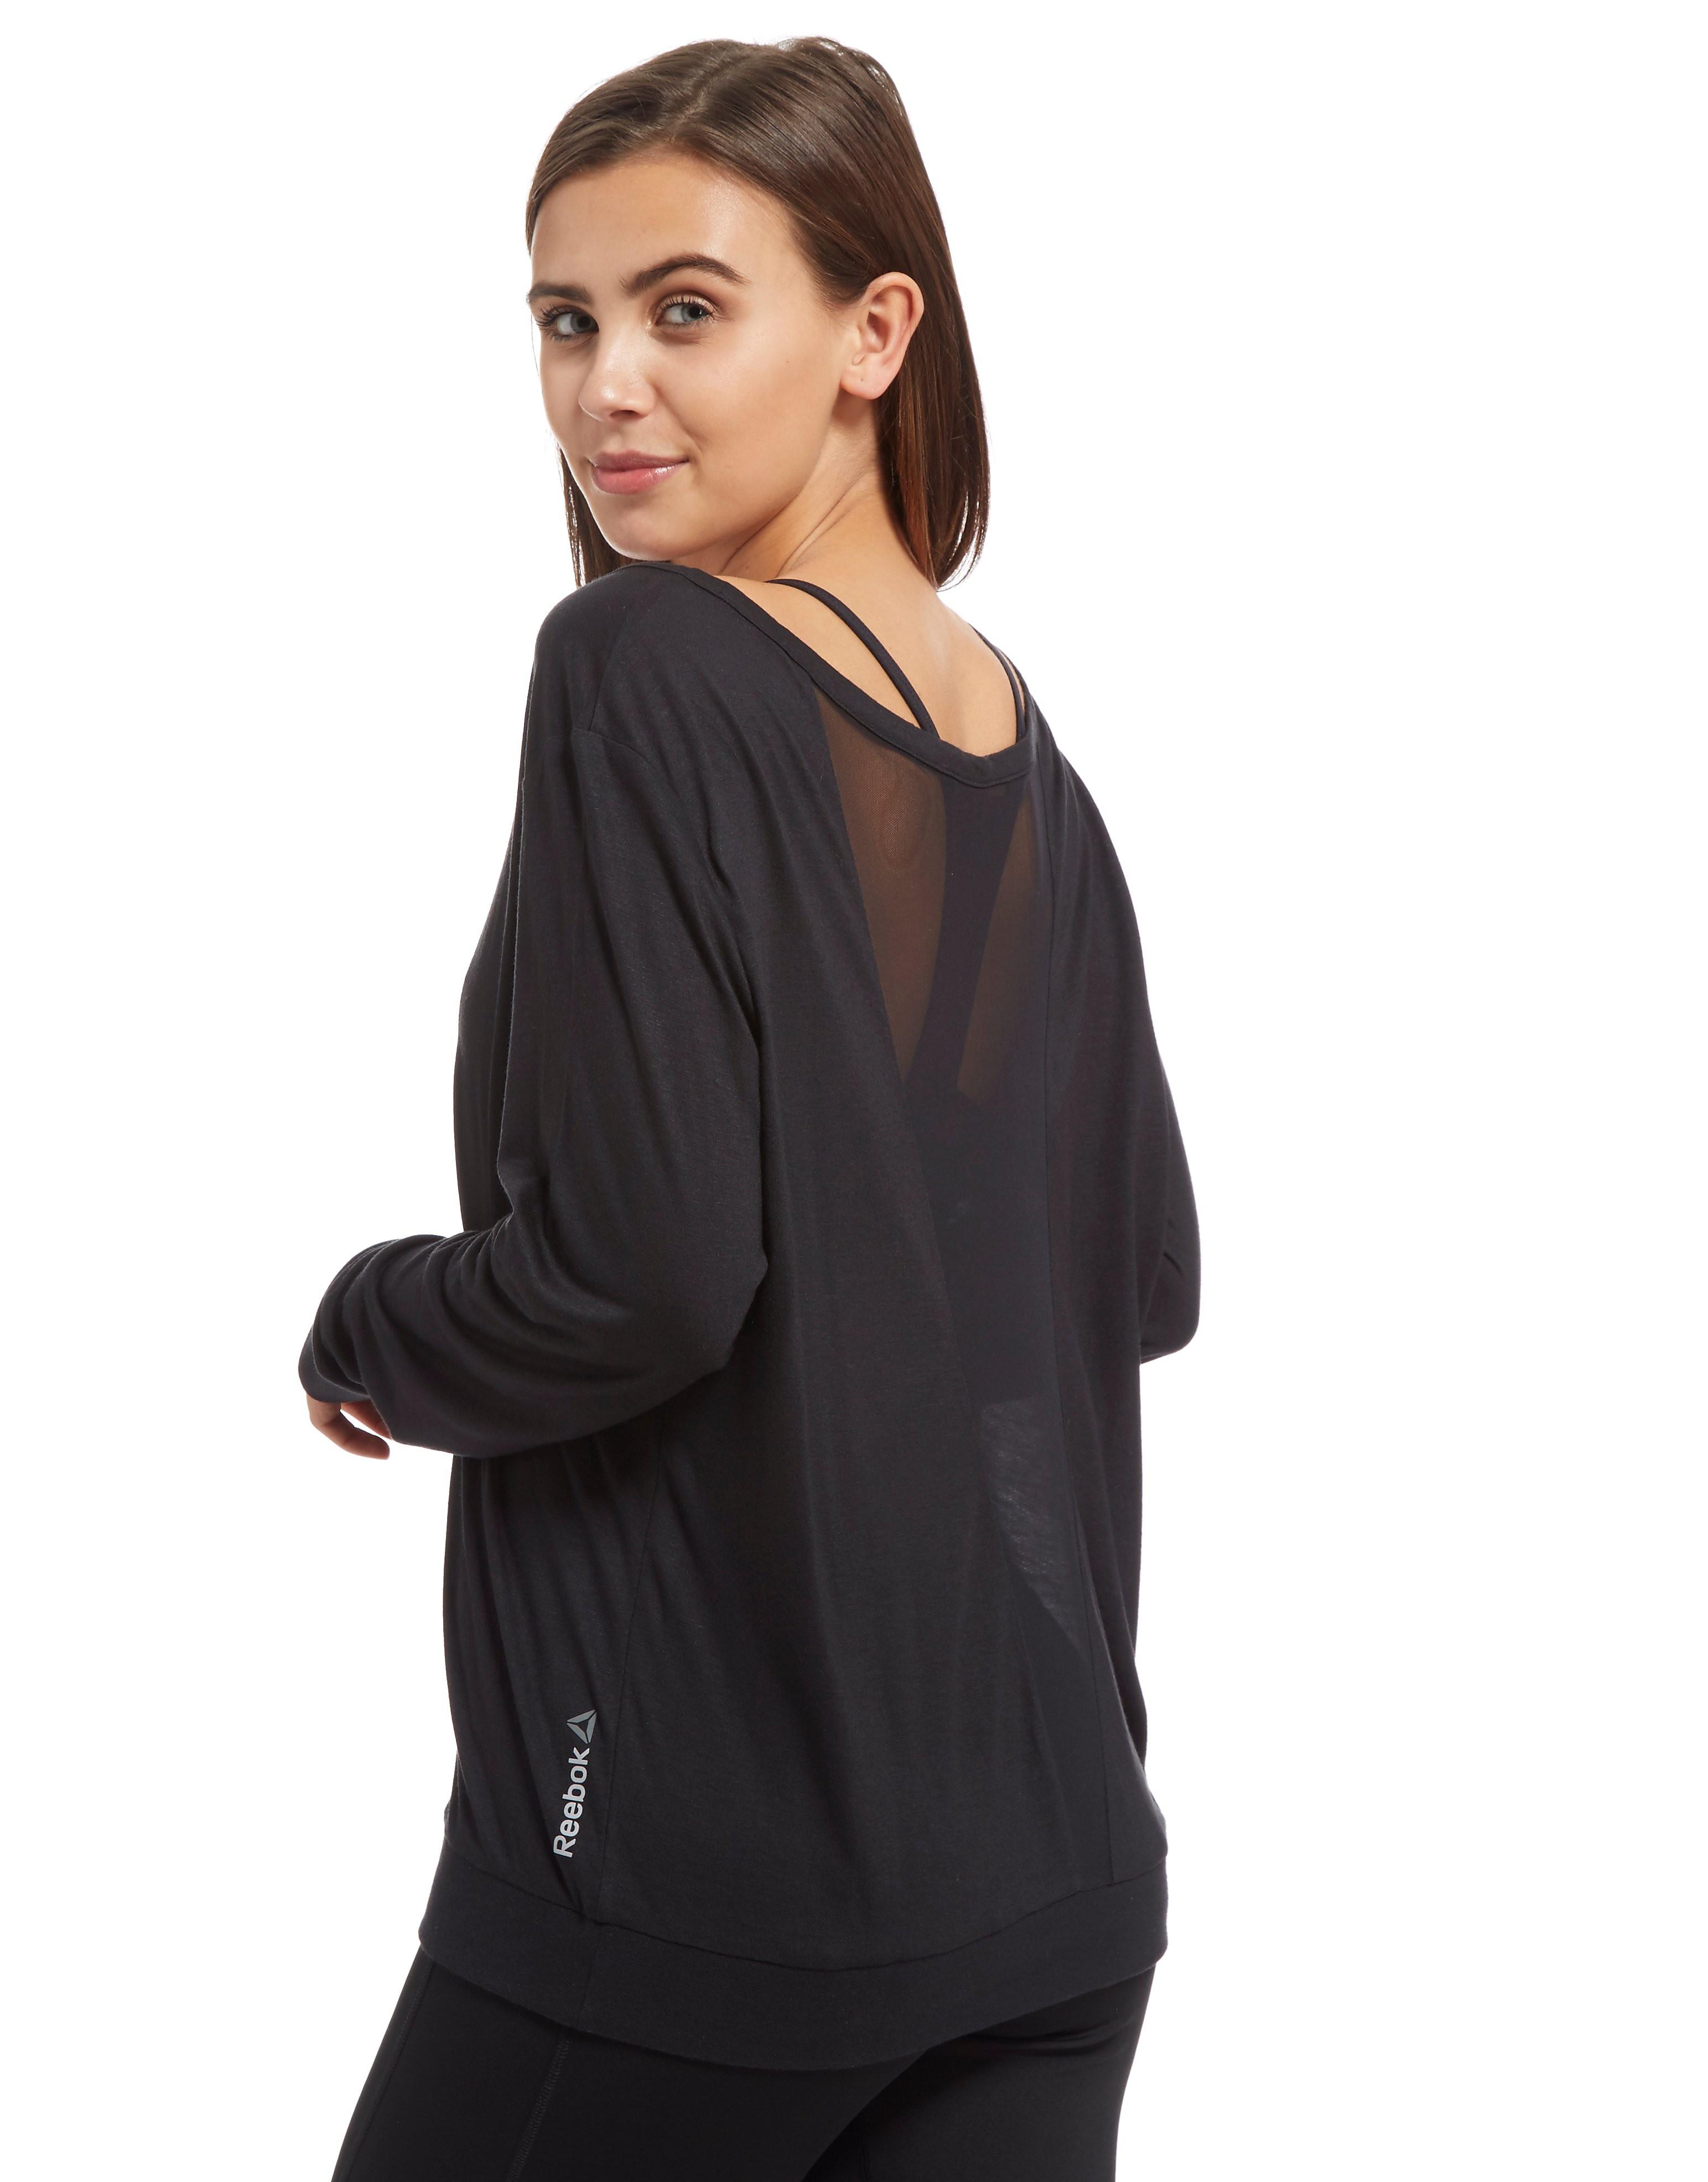 Reebok Mesh Long Sleev T-Shirt